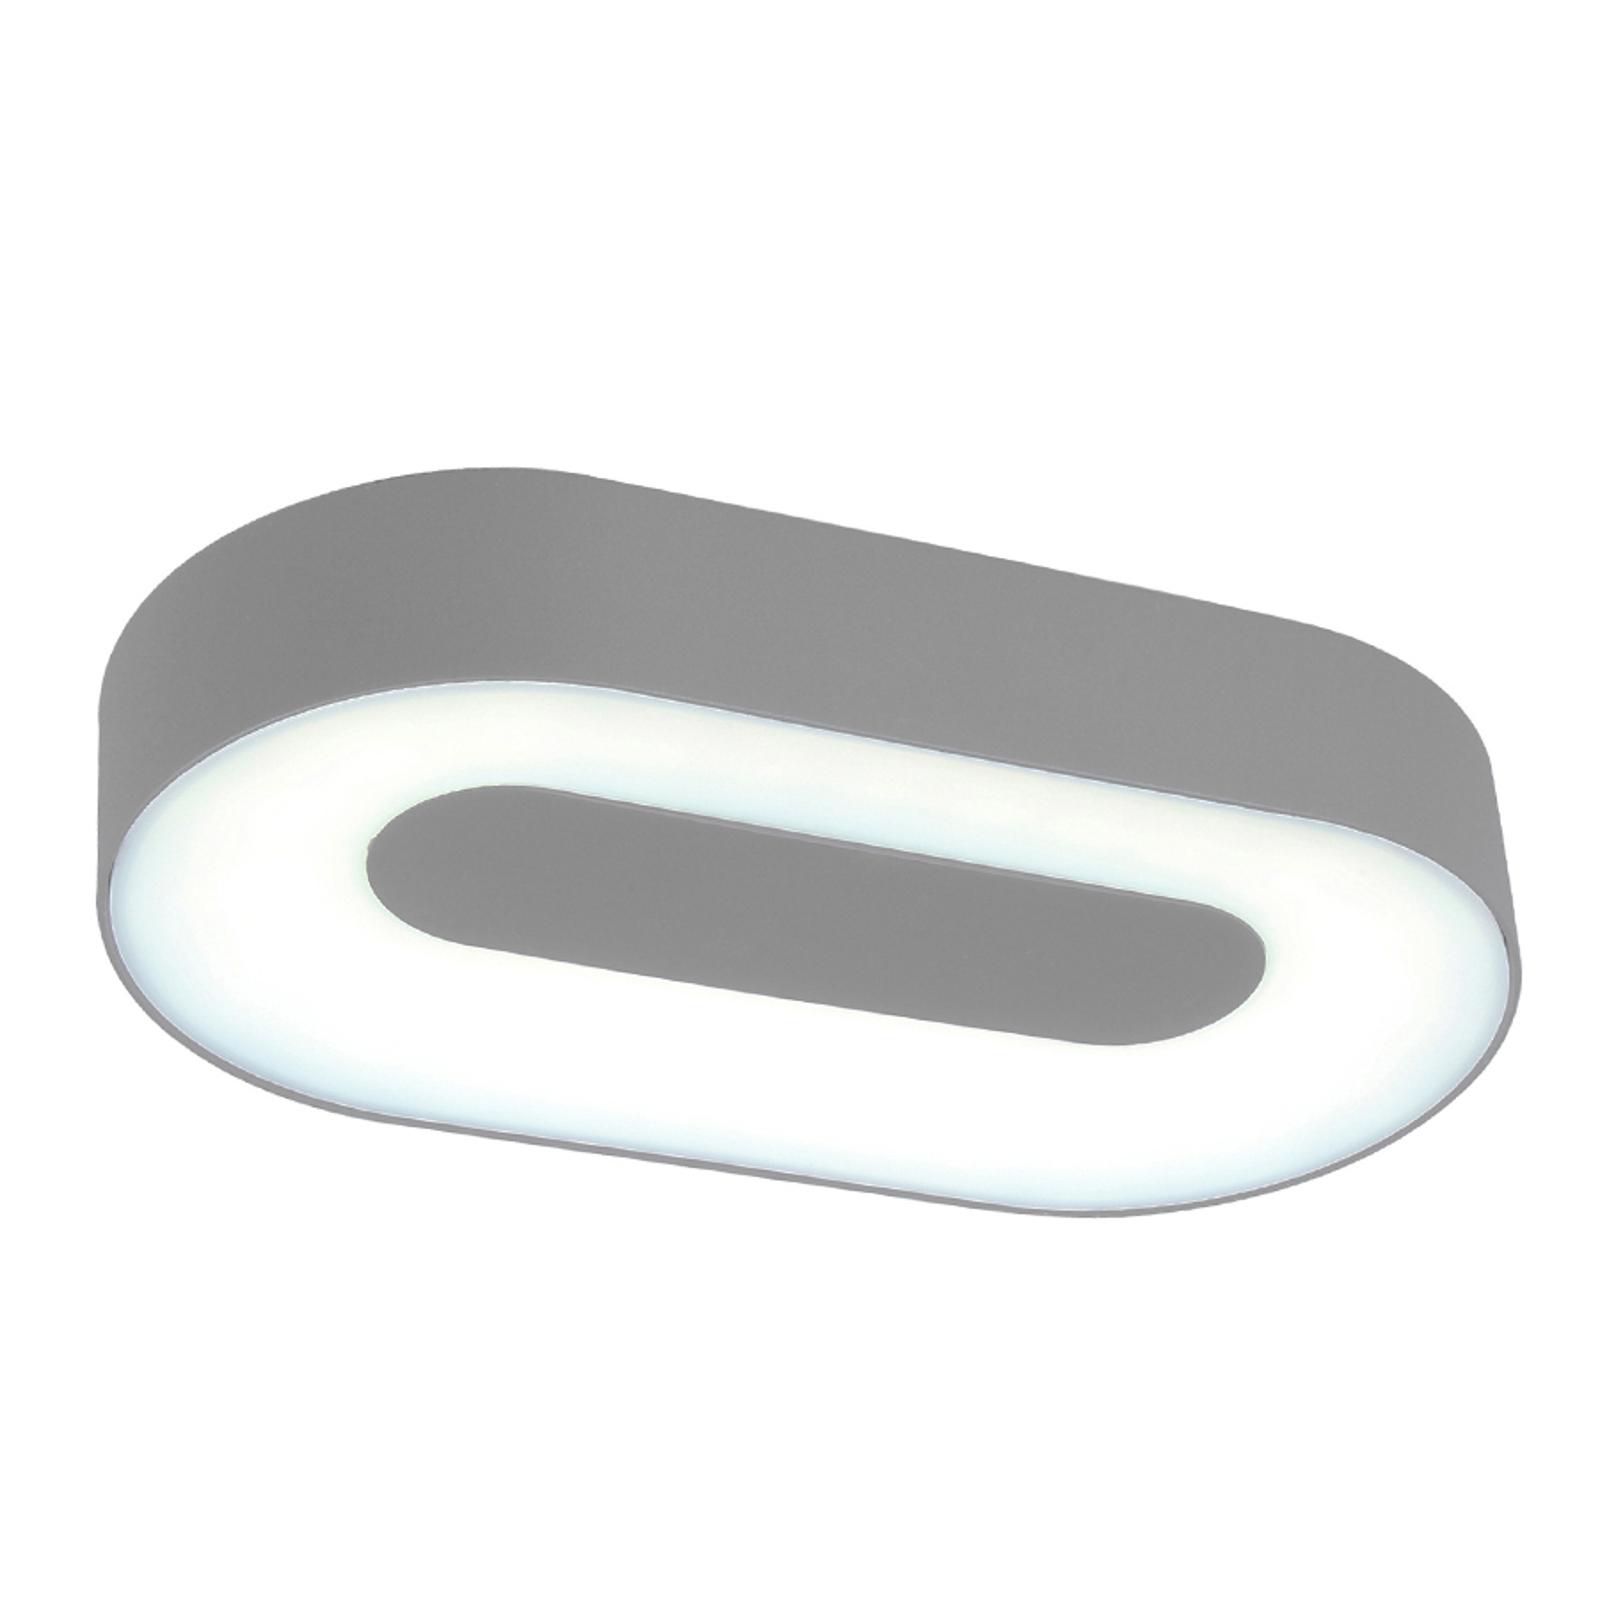 Ovale LED wandlamp Ublo voor buitenshuis